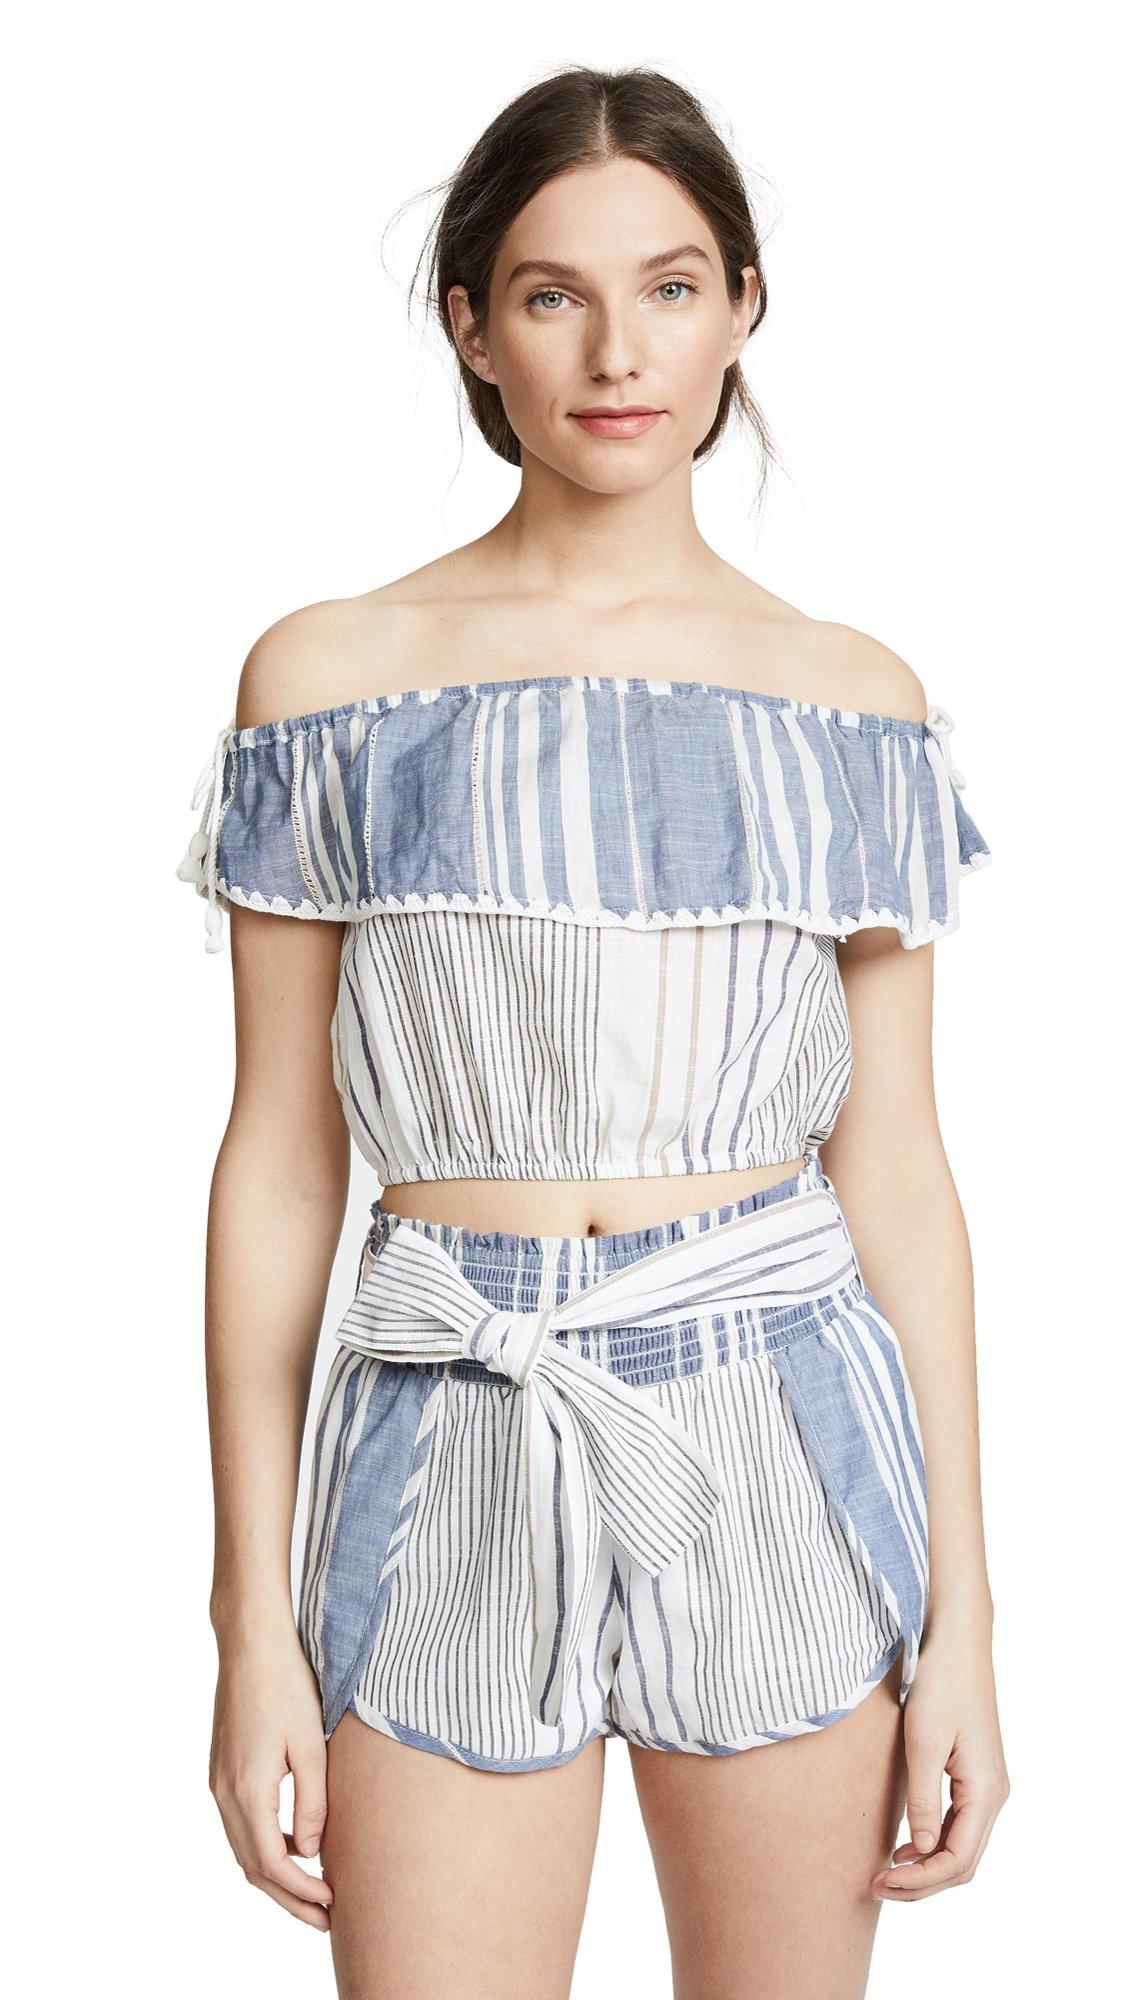 Saylor Women's Thia Off The Shoulder Top & Shorts Set, Blue/White, Large